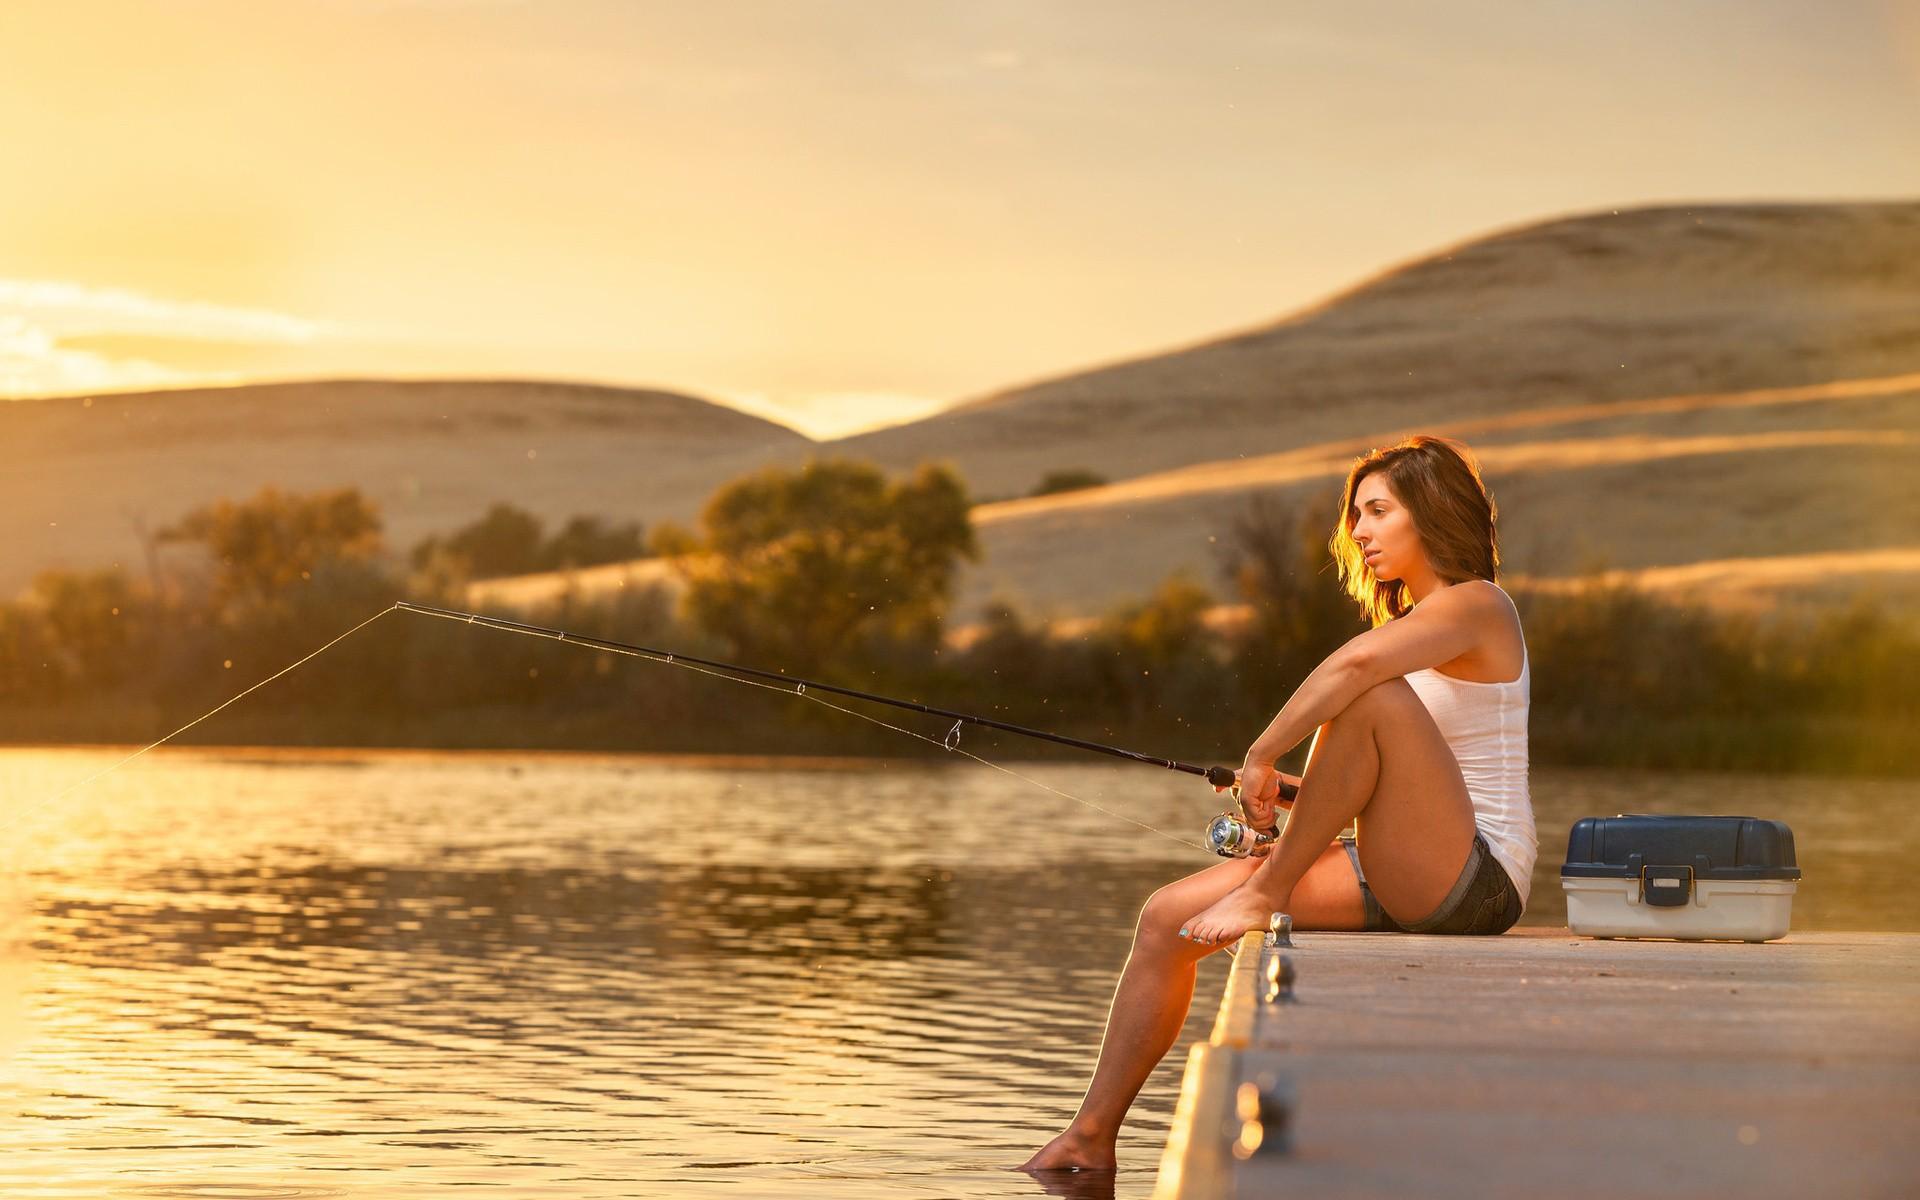 Приколы про рыбалку фото с девушками